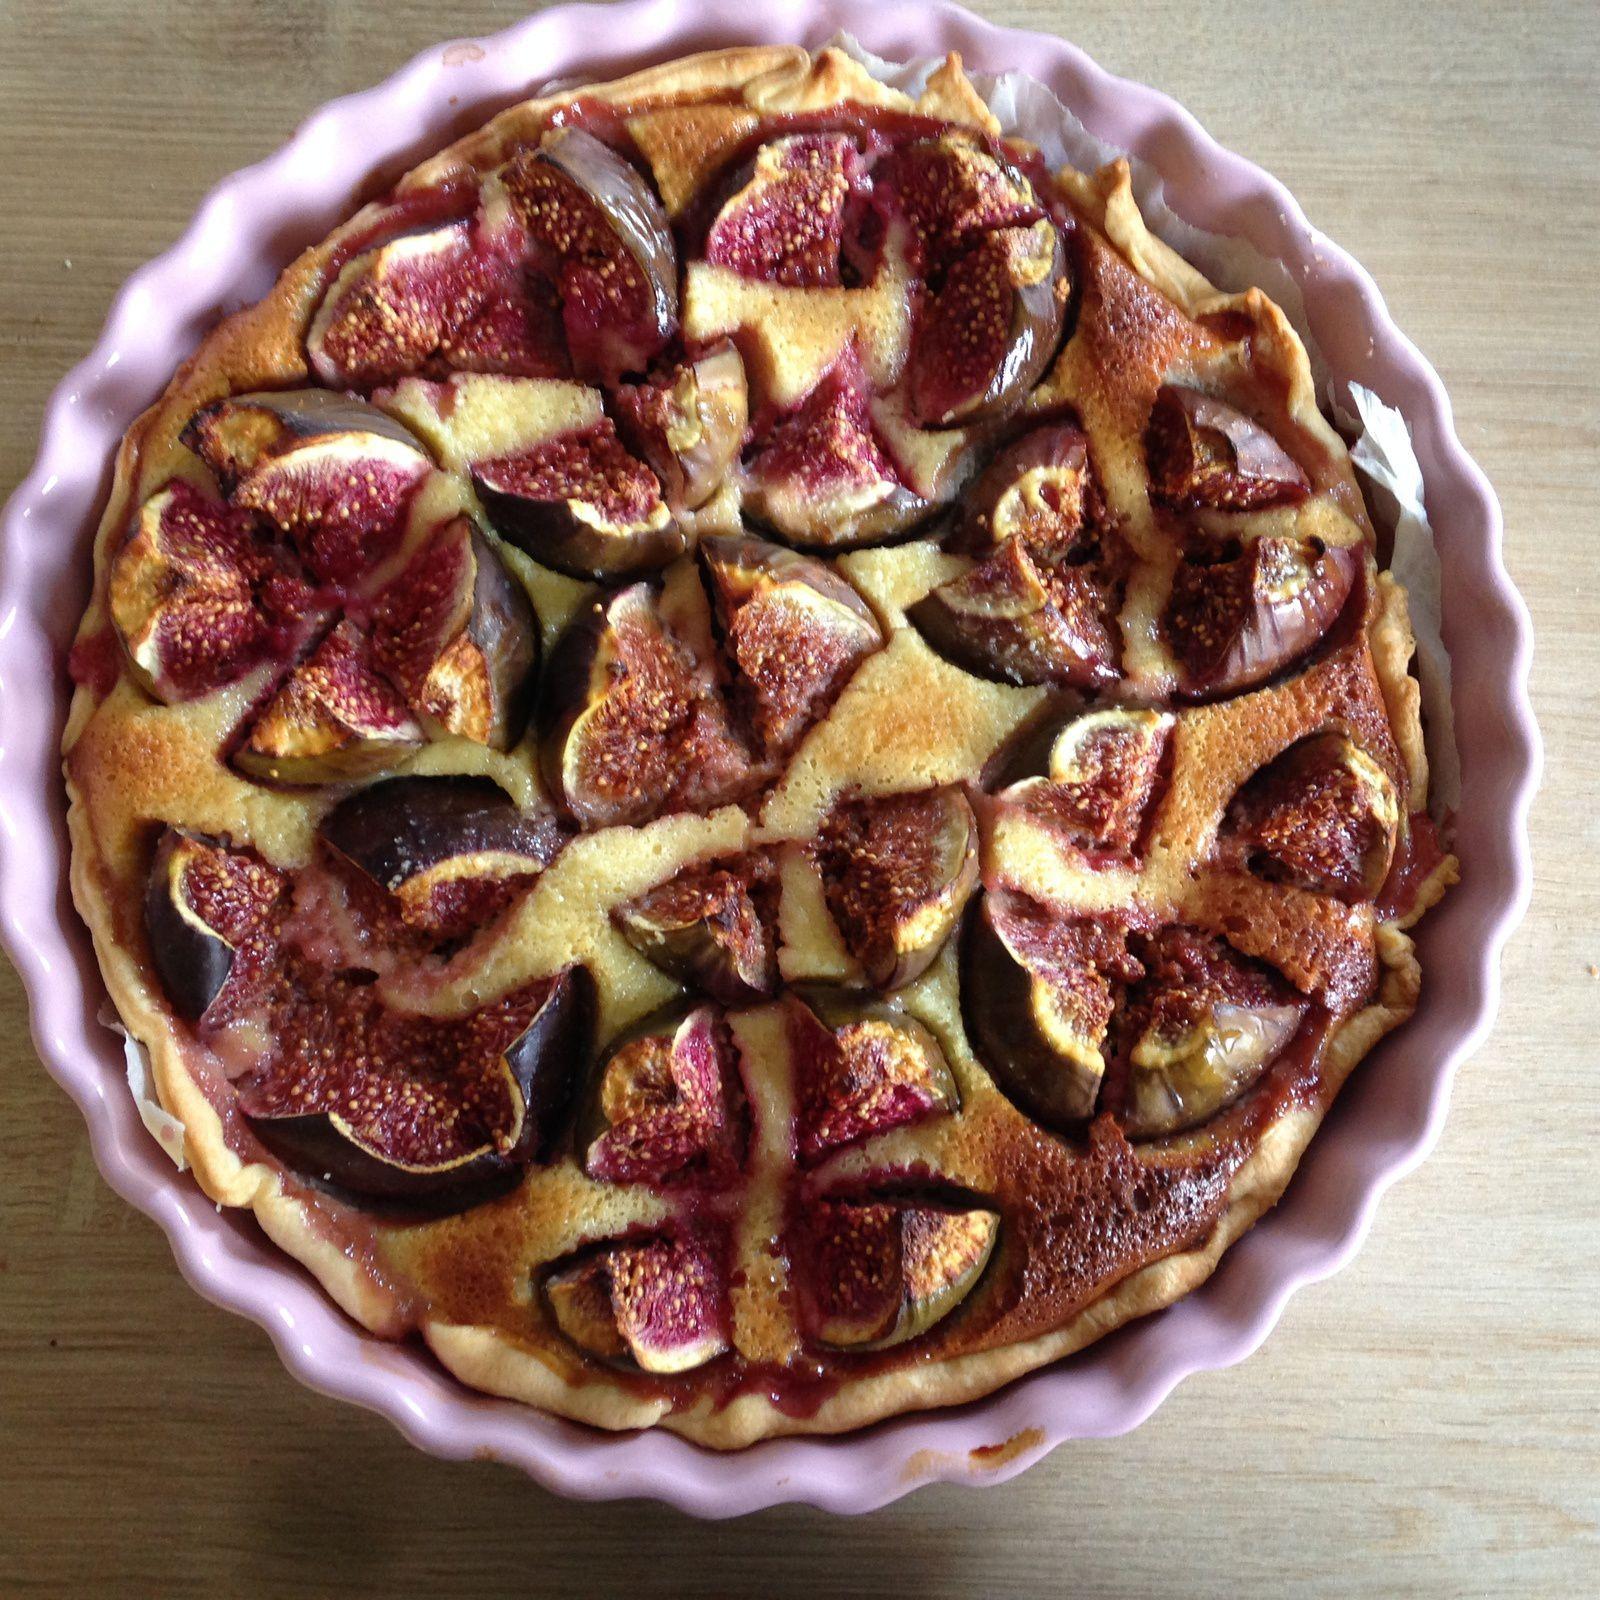 La tarte aux figues de Tonton Nico